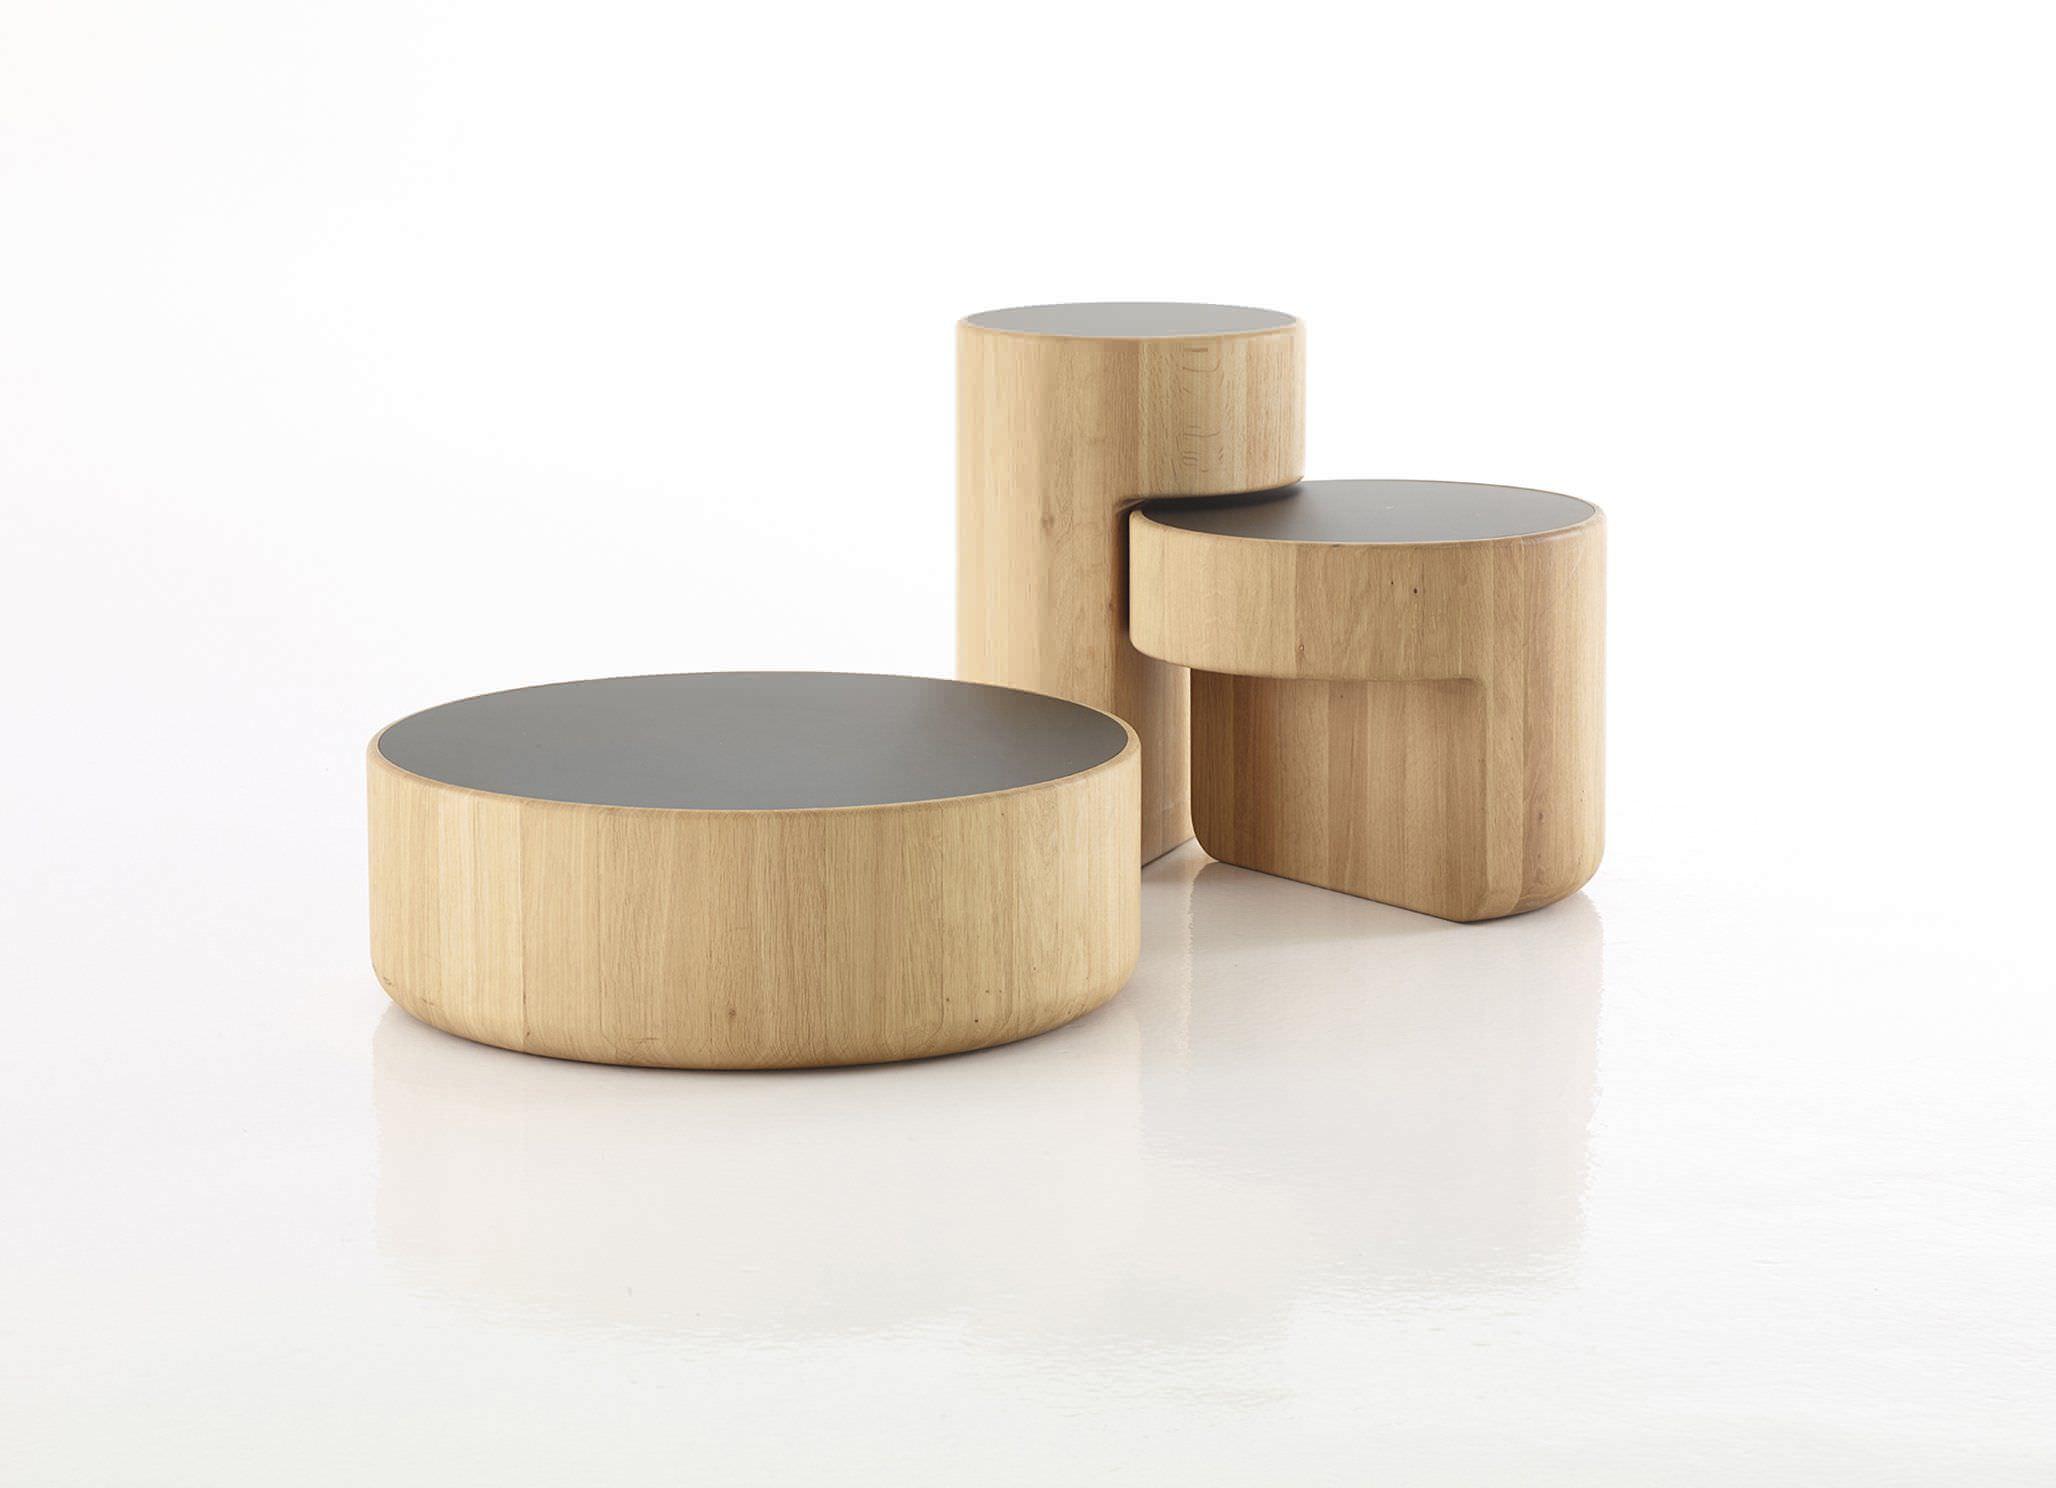 Dan Yeffet & Lucie Koldova contemporary nesting tables / oak / solid wood / glass